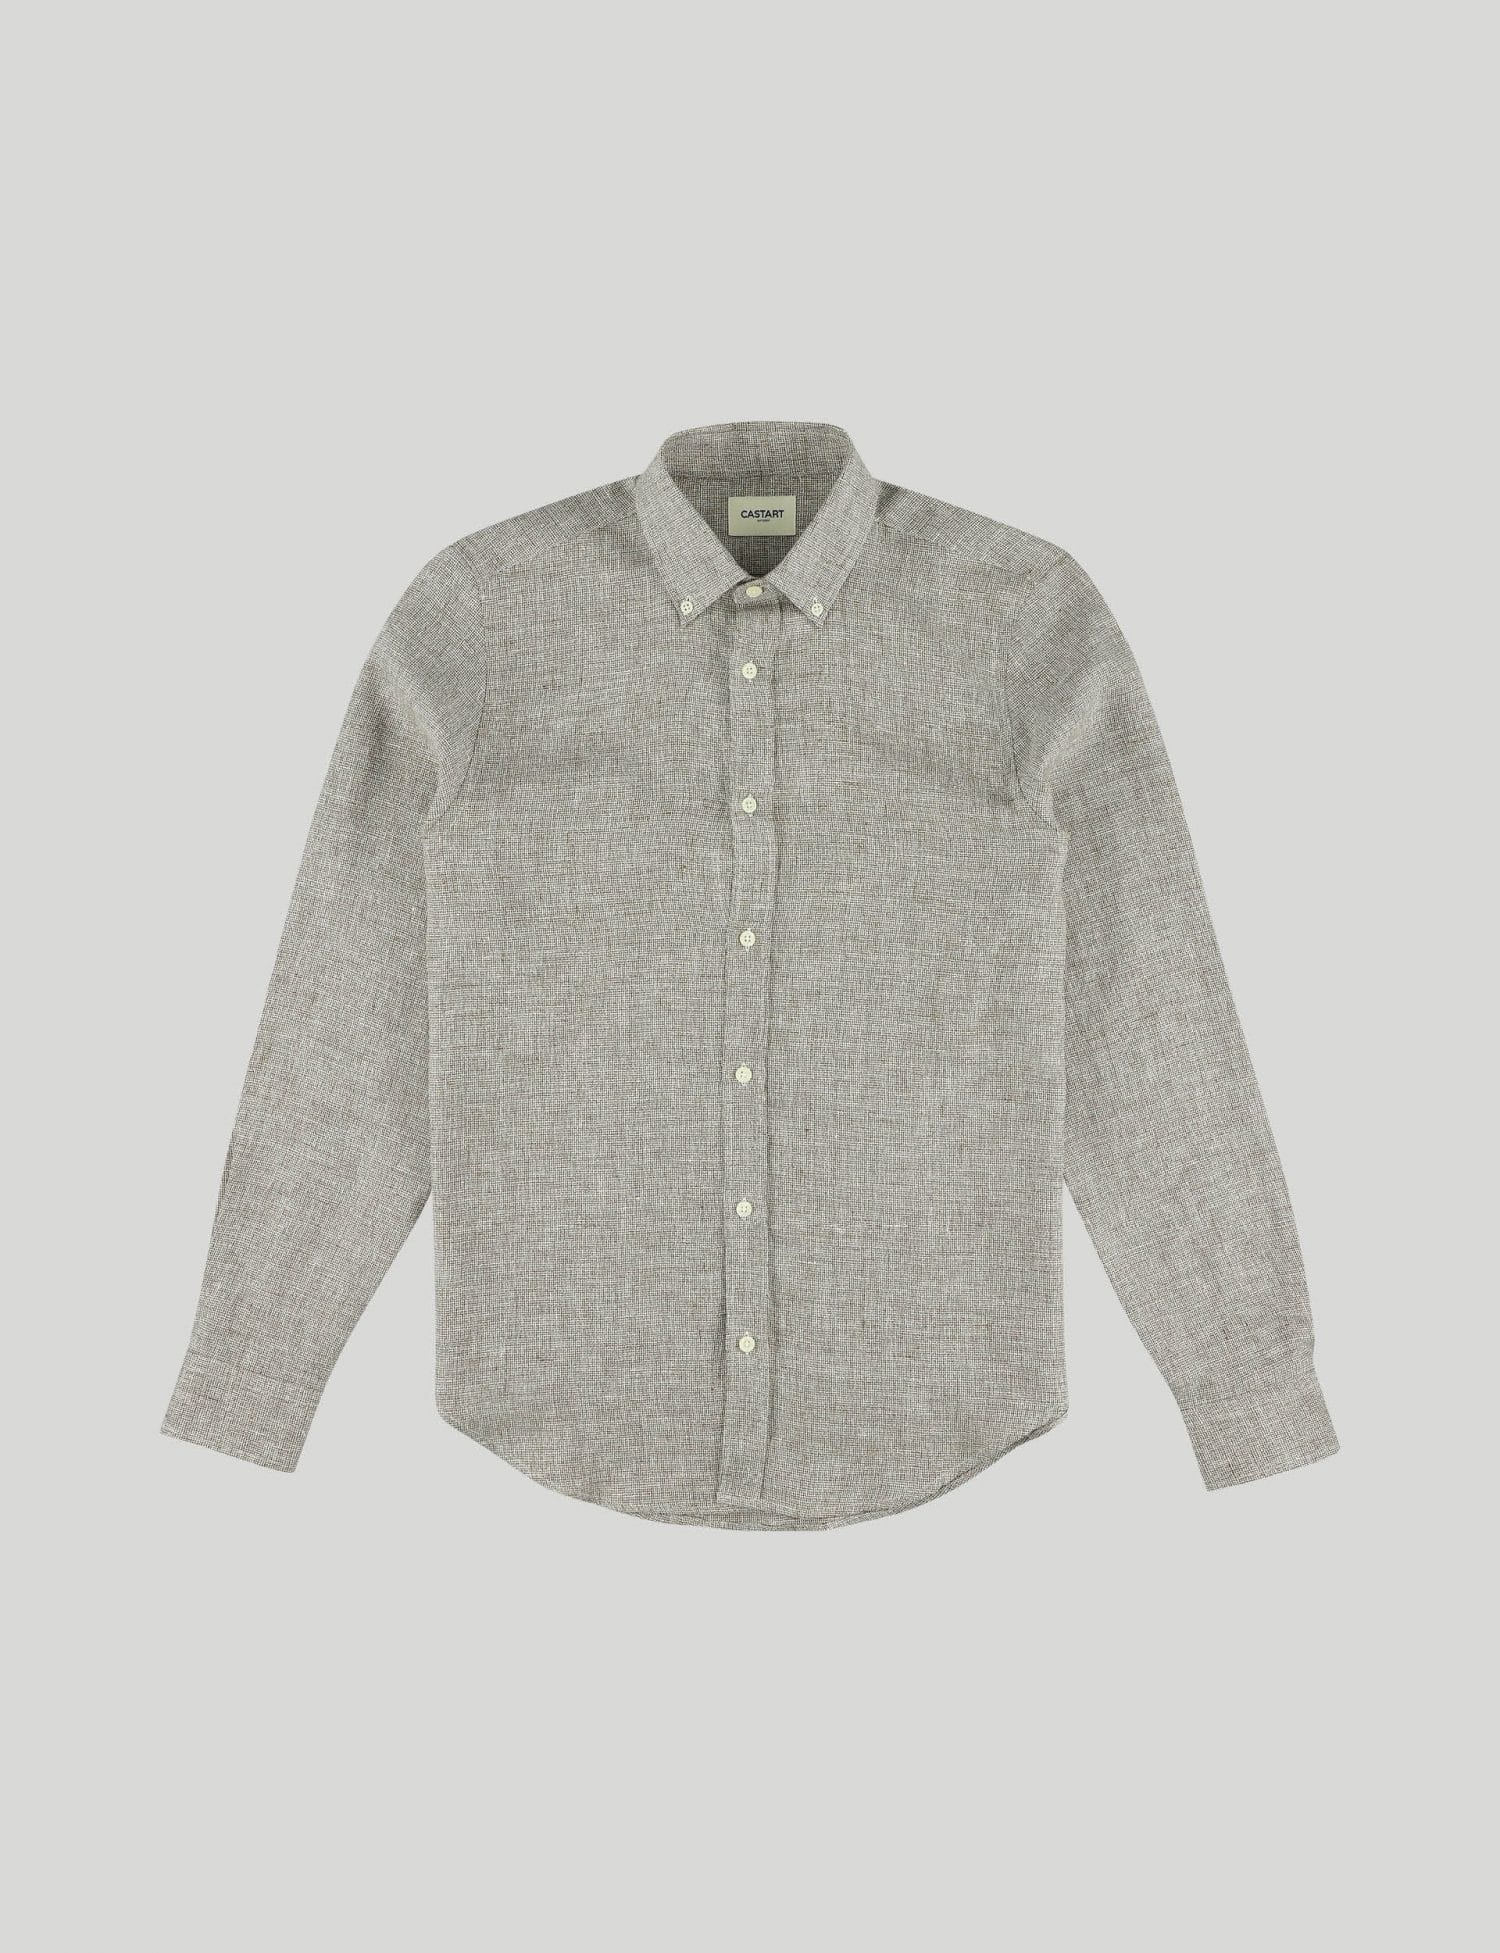 Castart - Devilshead LS Shirt - Brown